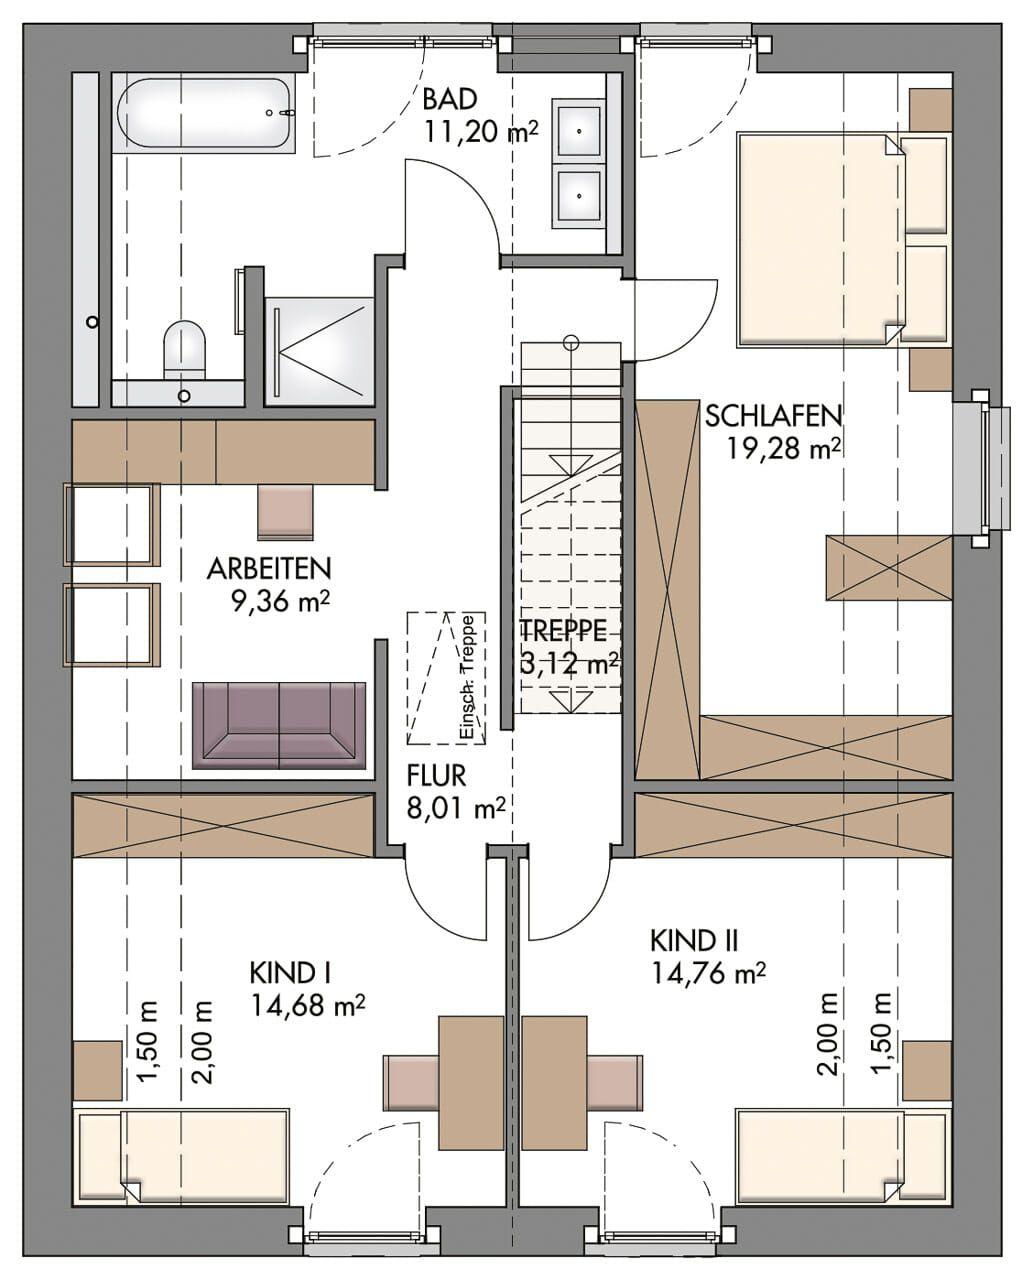 Einfamilienhaus Grundriss Dachgeschoss Länglich Mit Satteldach